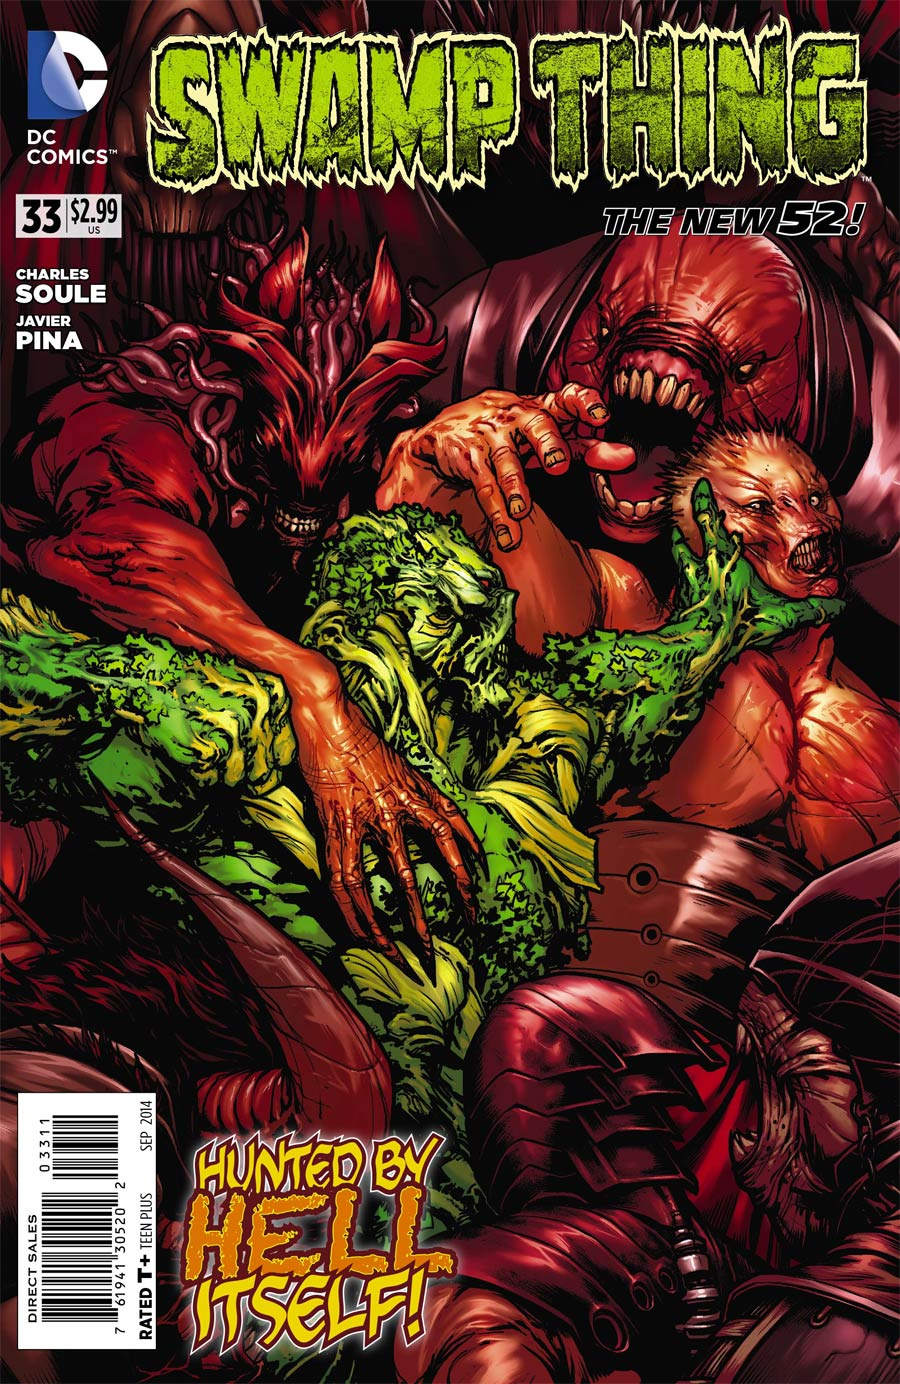 Swamp Thing Vol 5 #33